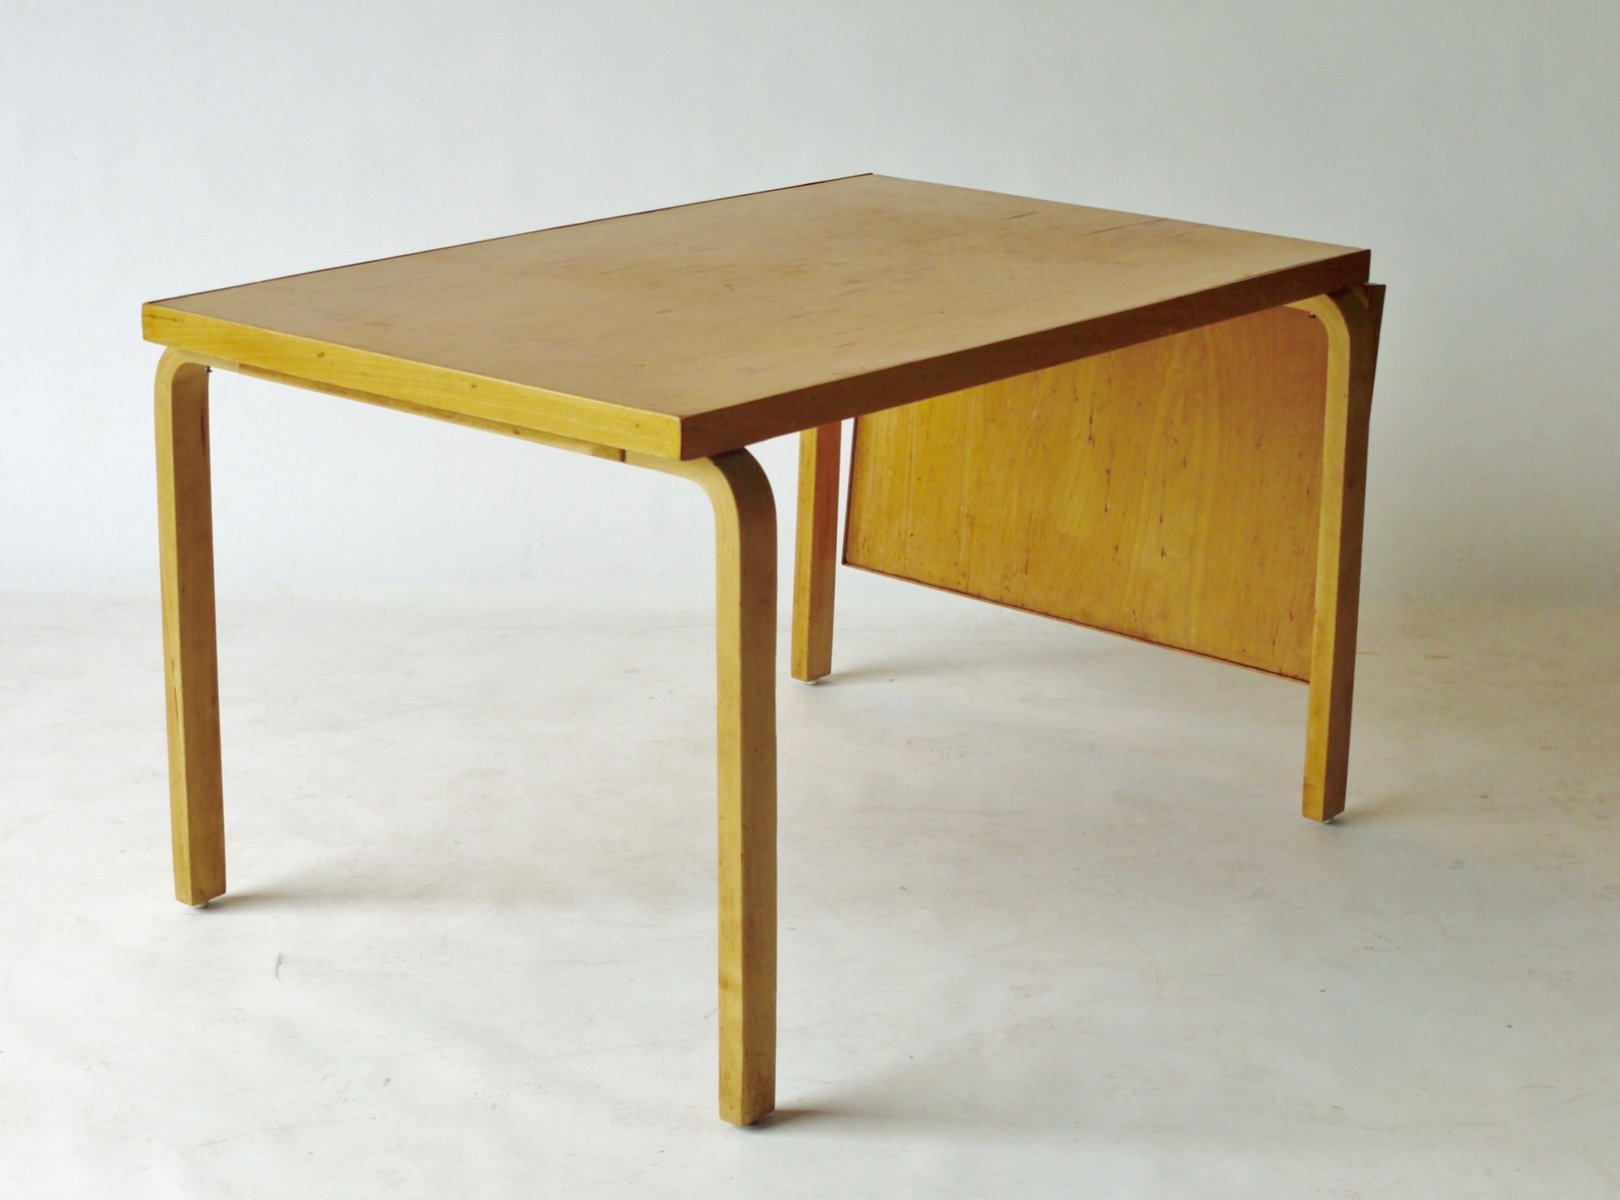 Drop Leaf Extendable Dining Table by Alvar Aalto for Artek, 1940s ...